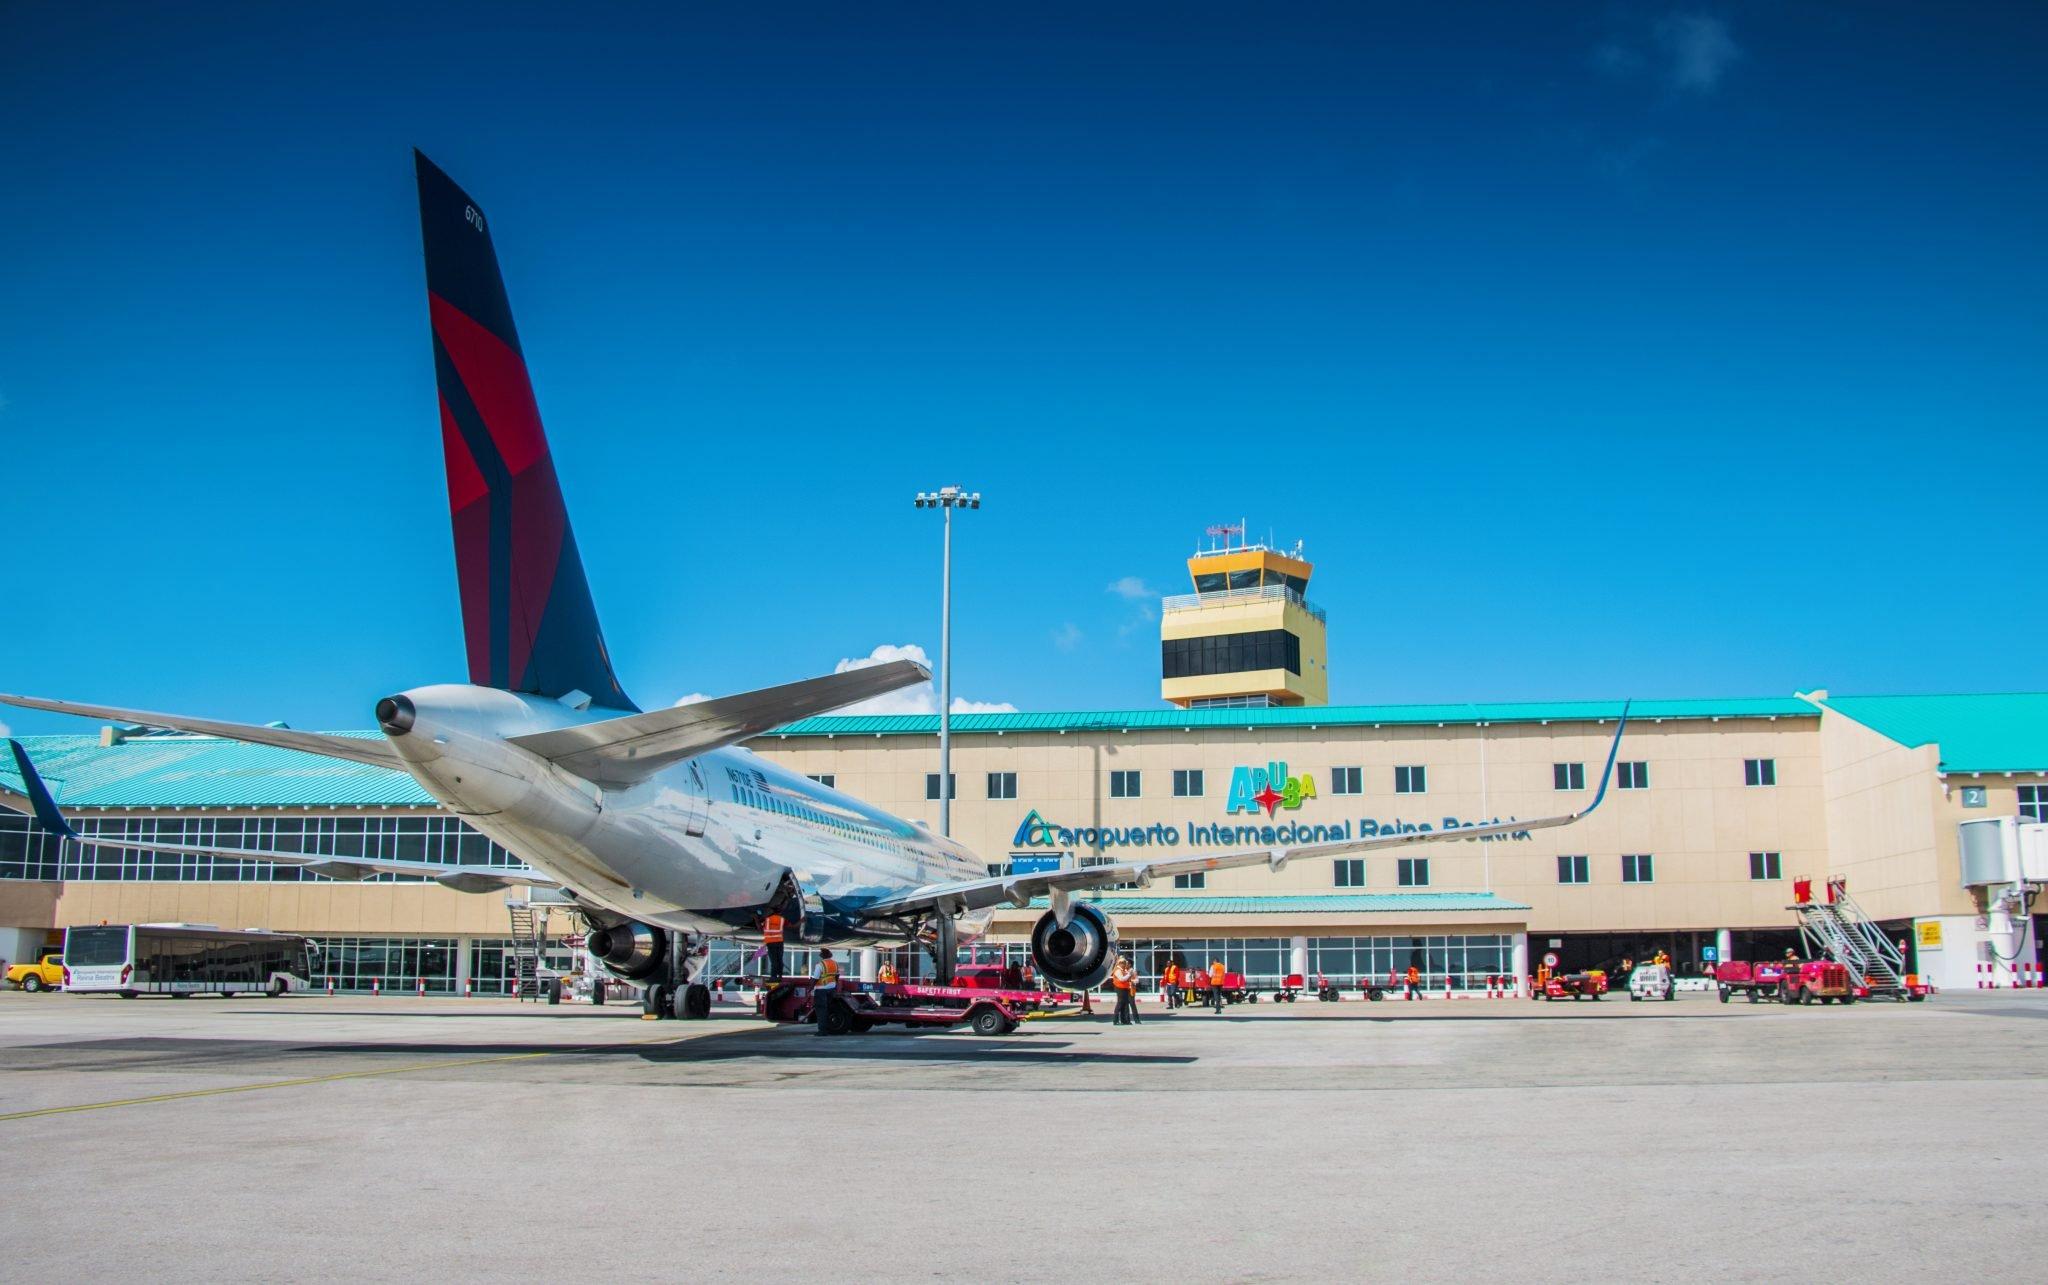 Delta Airlines at Aruba airport